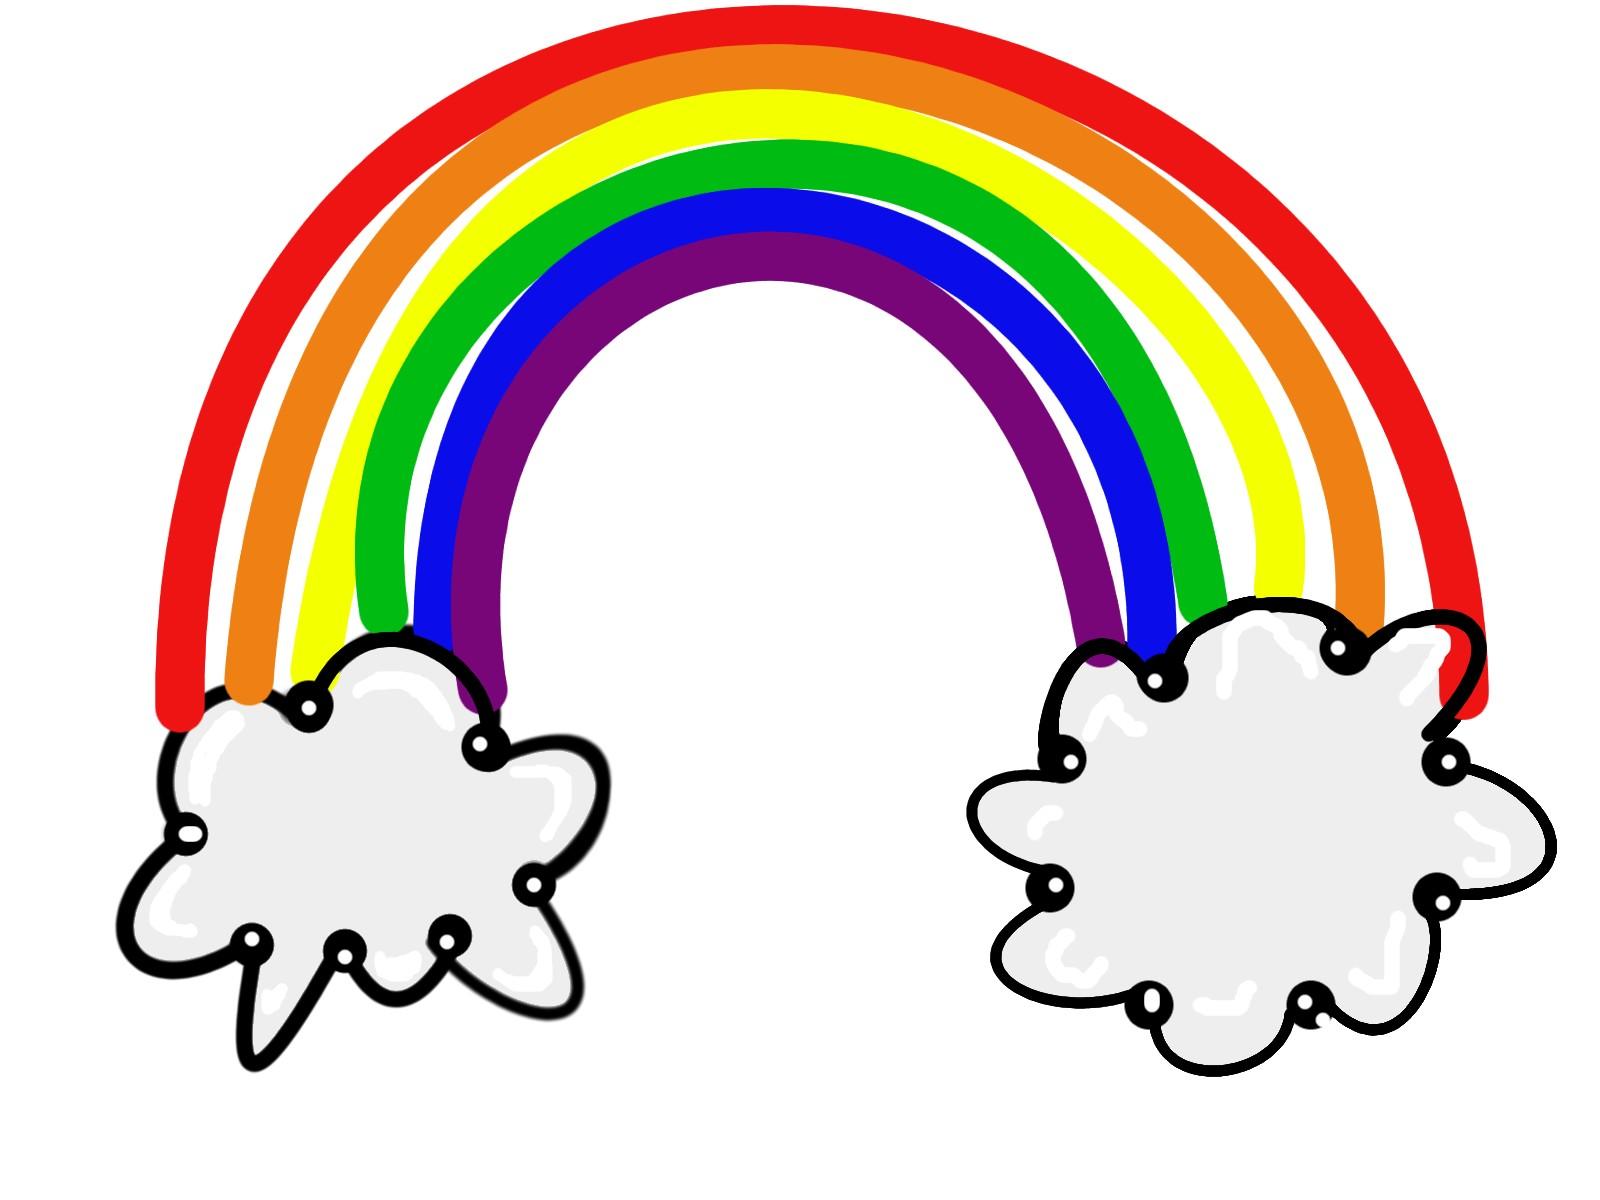 Black and white rainbow outline free cli-Black and white rainbow outline free clipart images clipartall-7